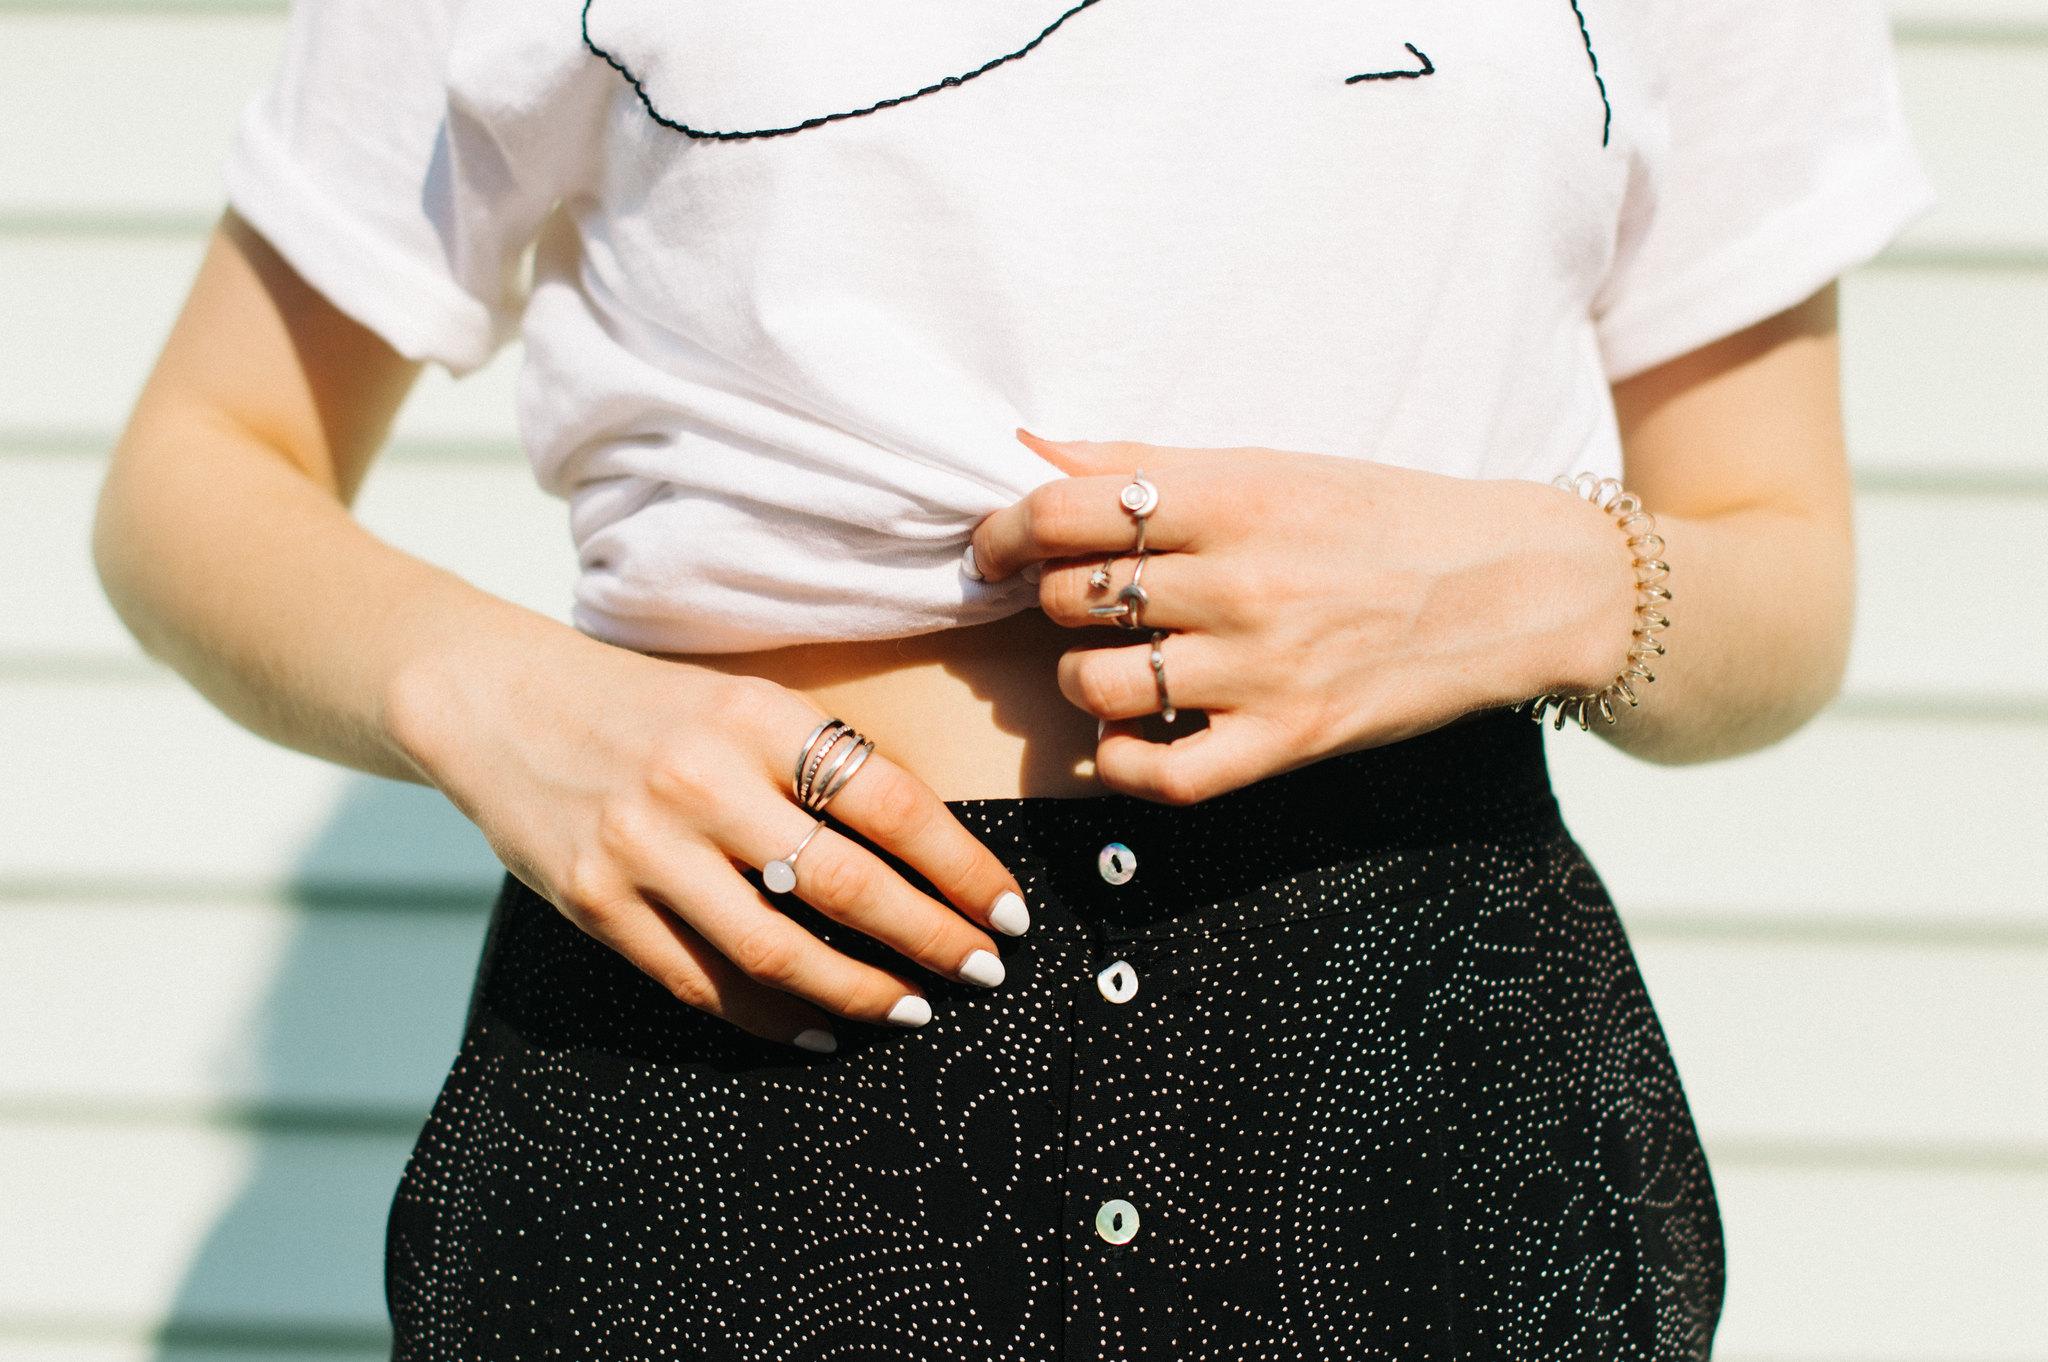 Jaelle Designs shot by Lauren O'Neil on juliettelaura.blogspot.com